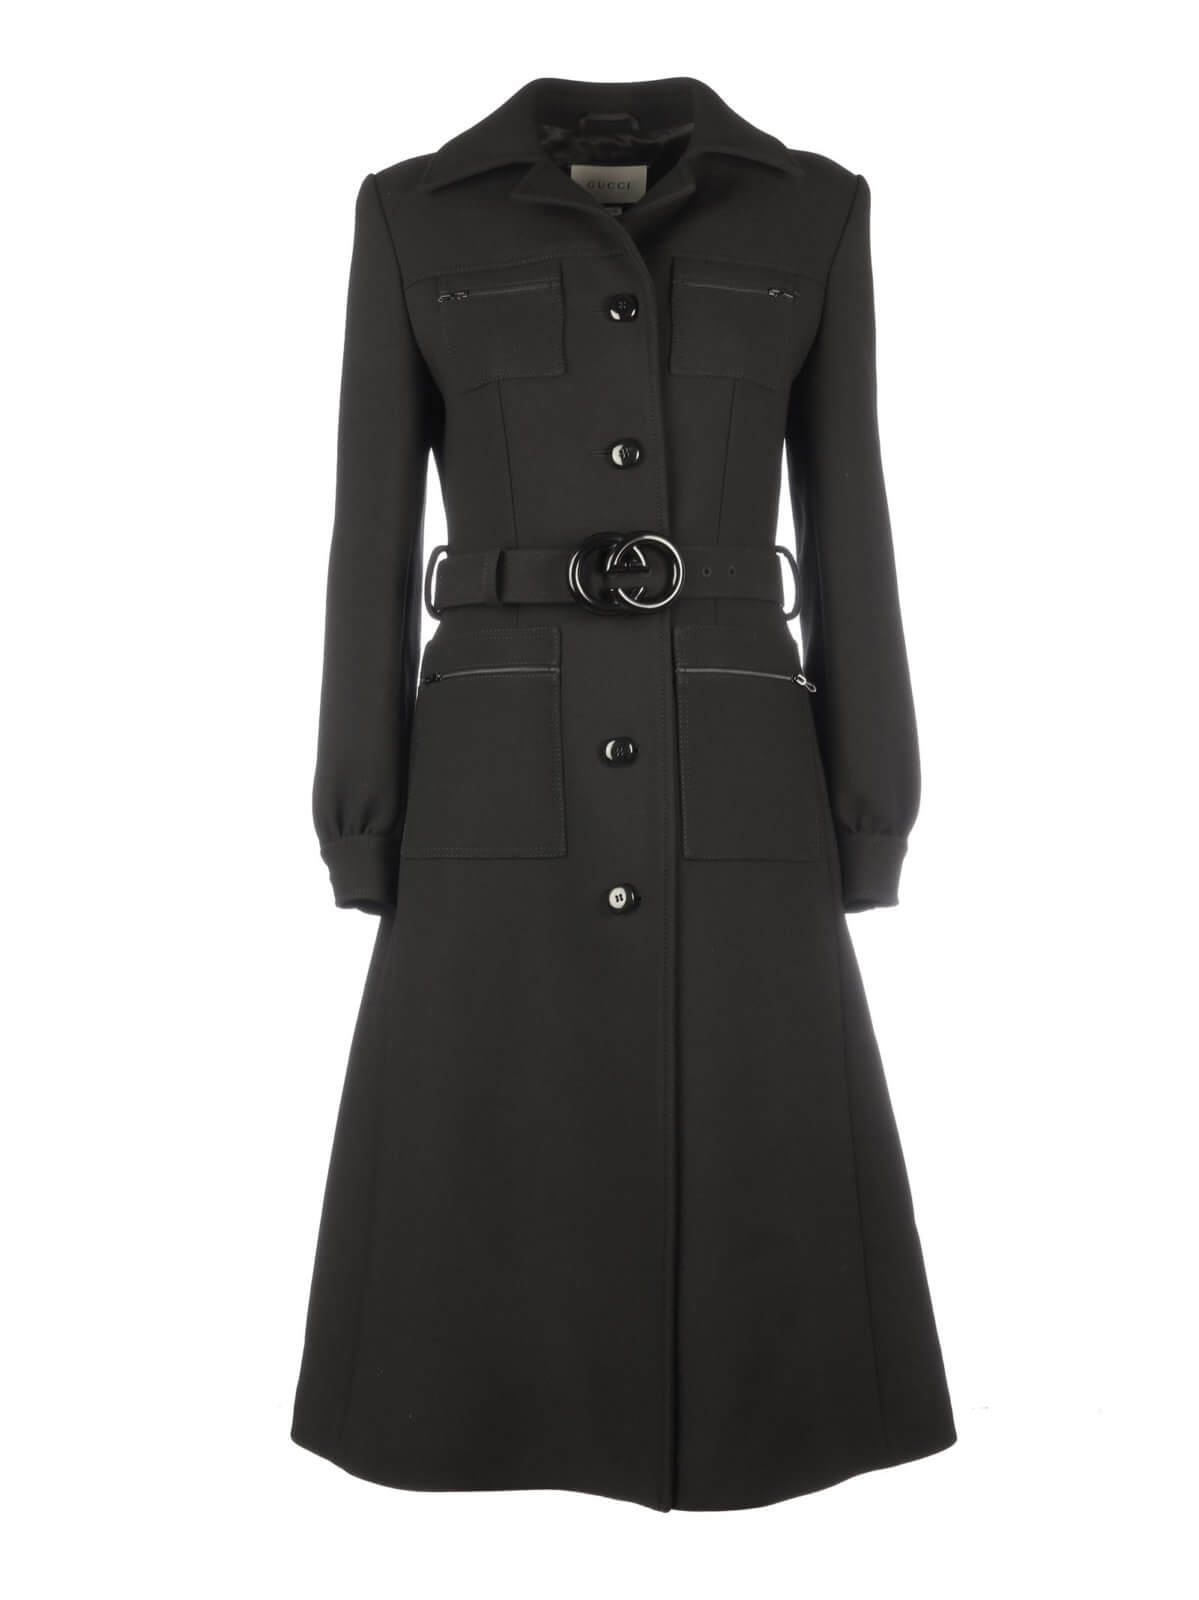 Designer Gucci Womens Black Coat